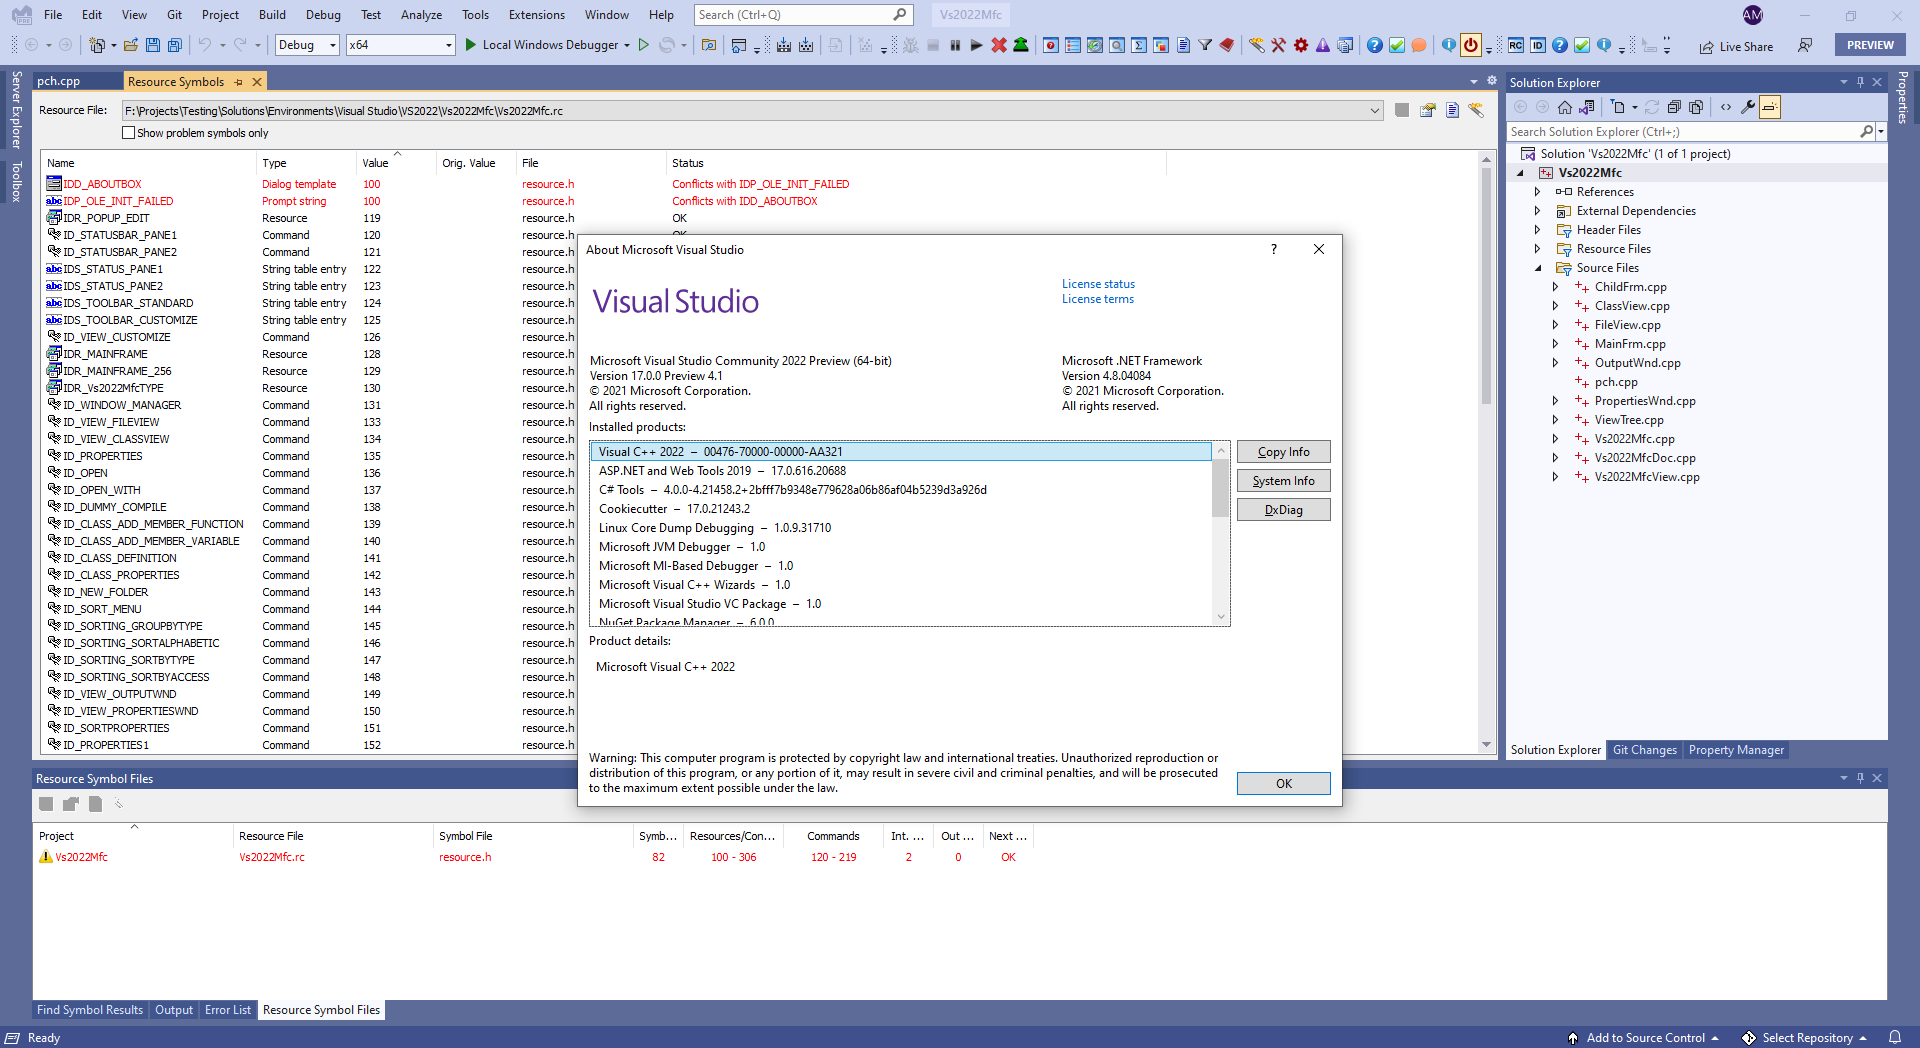 ResOrg 2.0.10.31 running within Visual Studio 2022 Preview 4.1